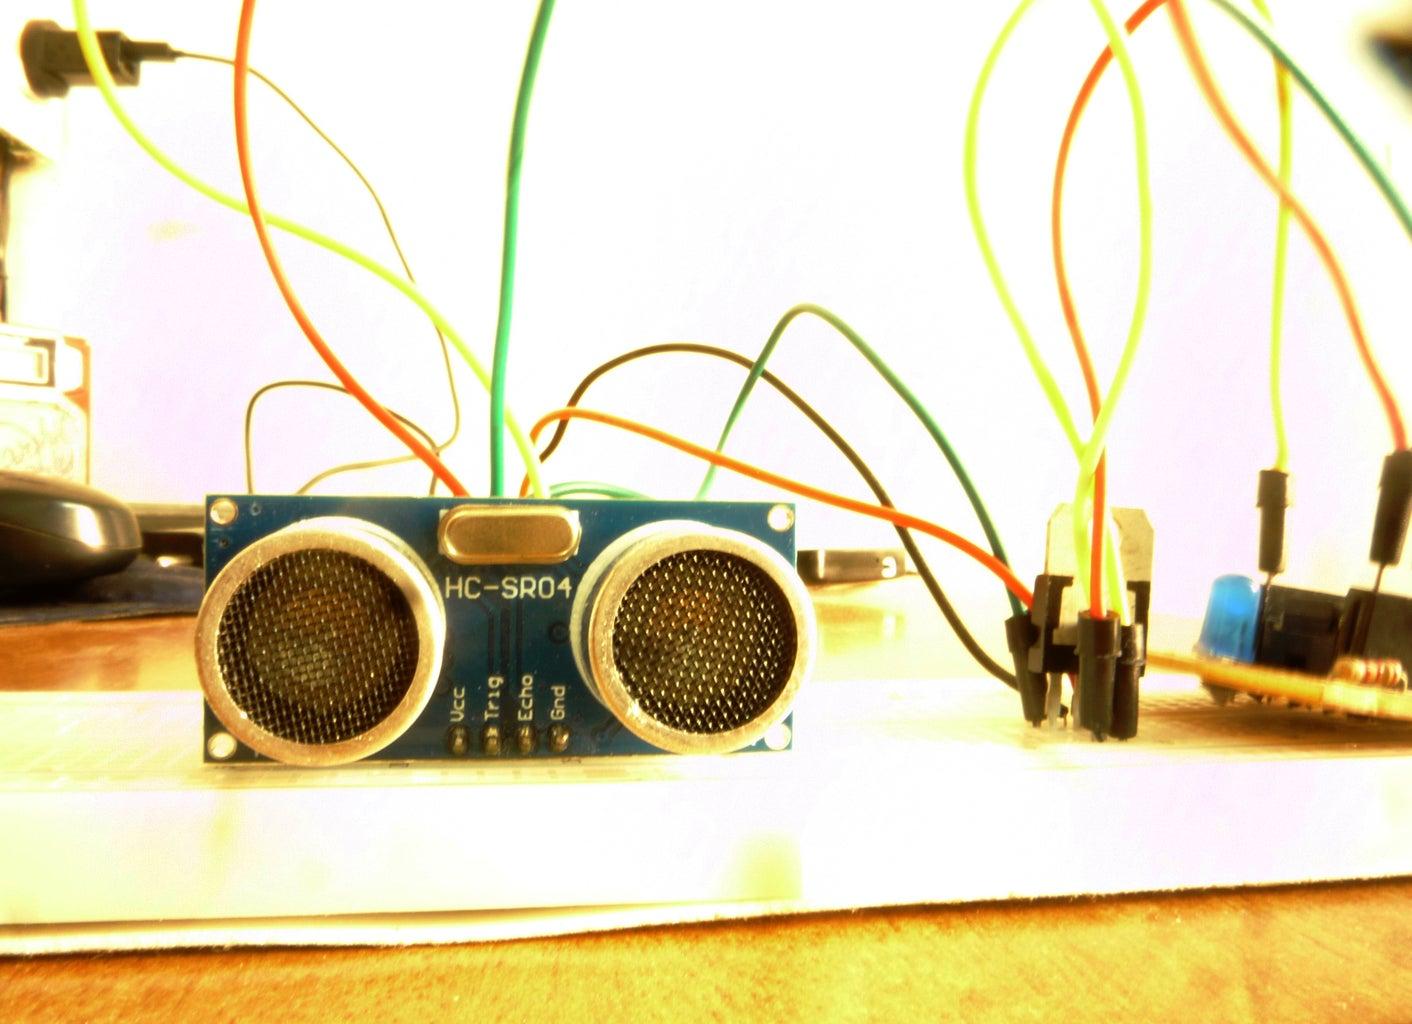 Using Sensors Like Ultrasonic Sensor